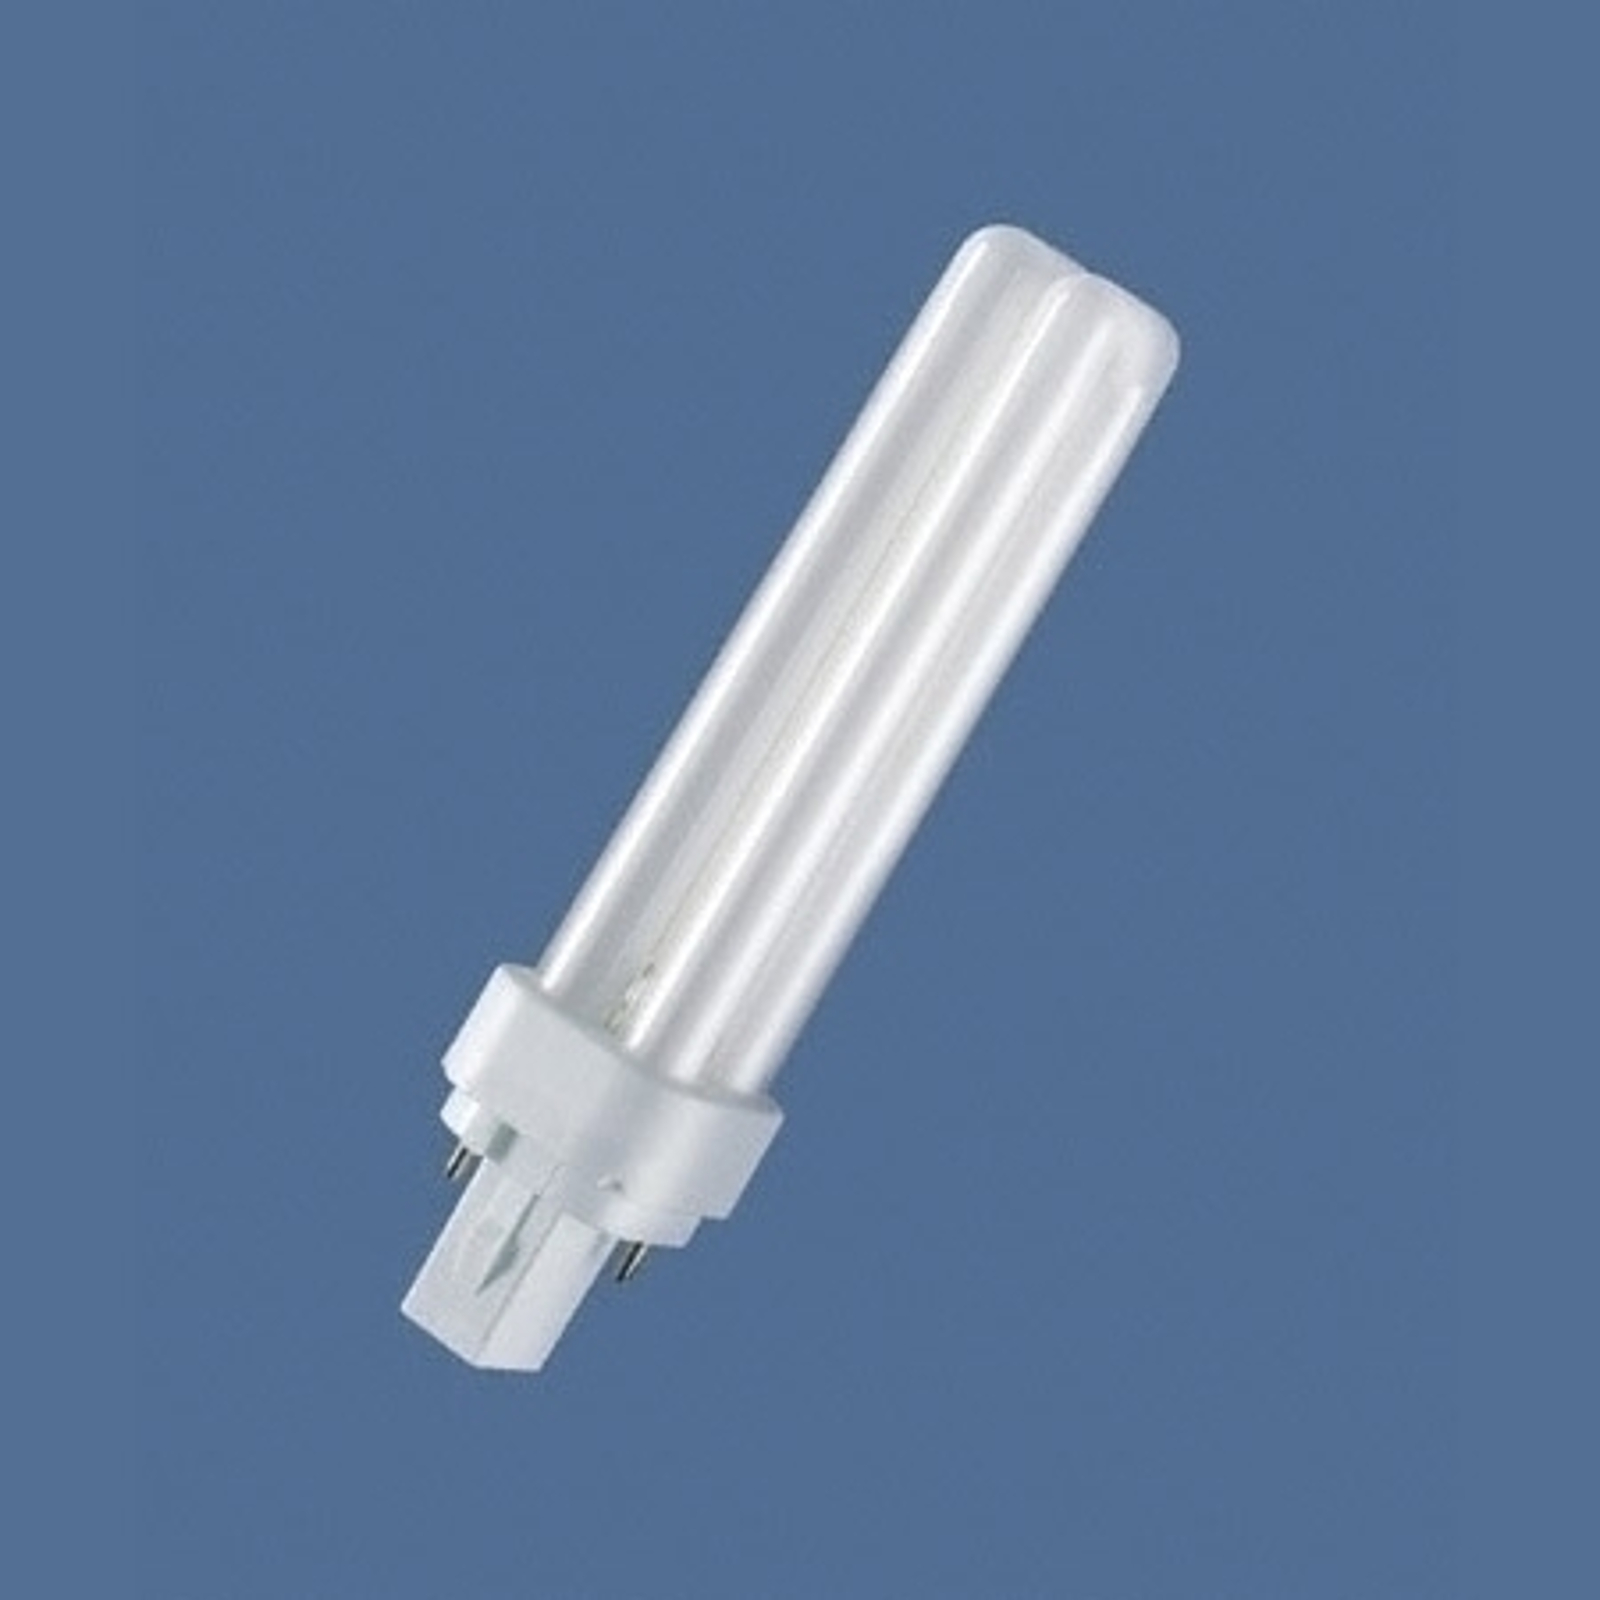 G24d 26W 840 Kompaktleuchtstofflampe Dulux D